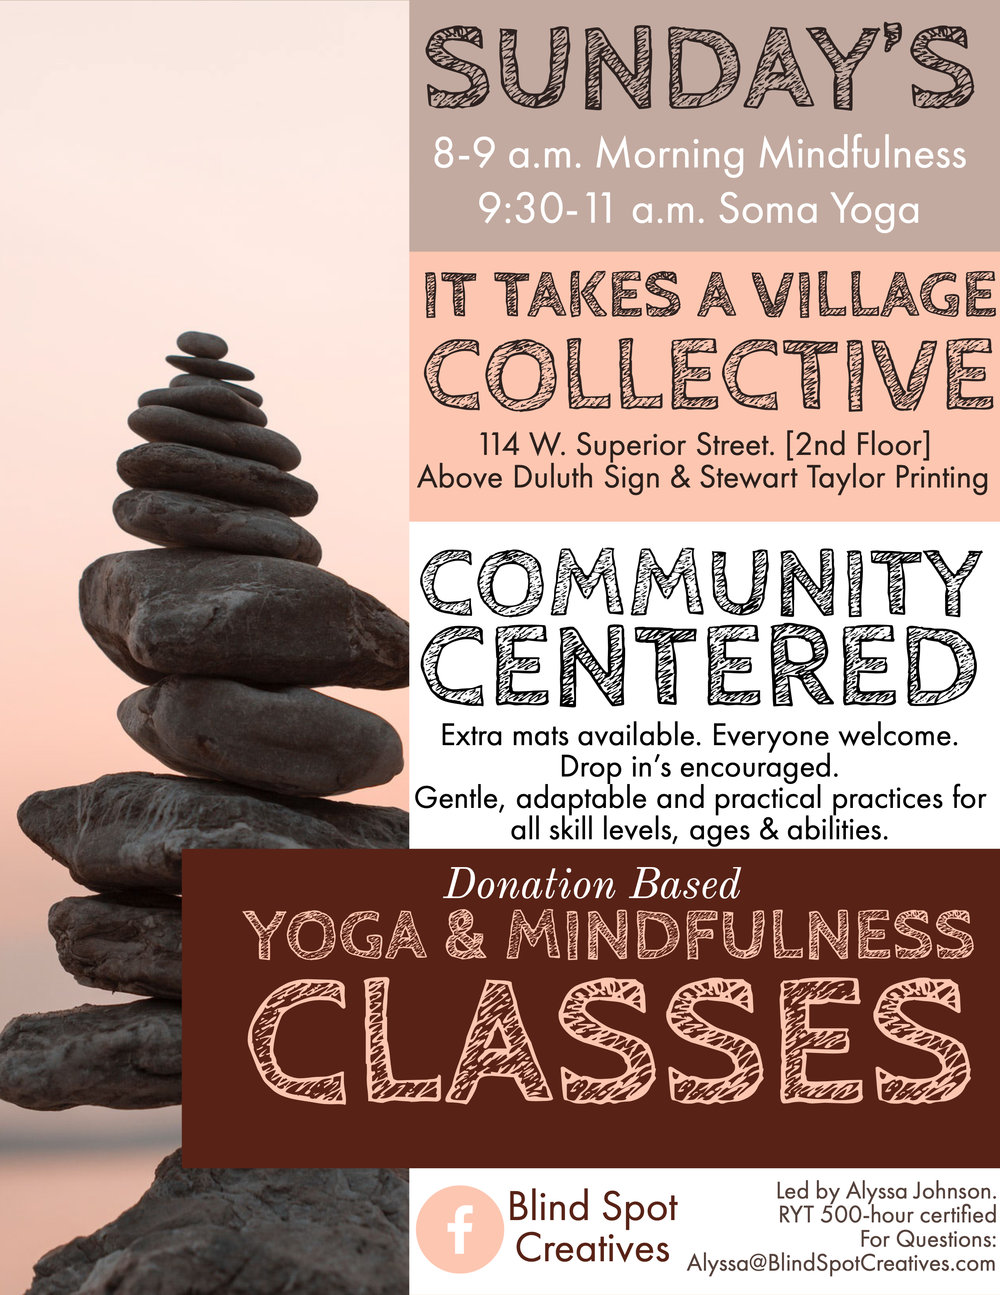 Morning Mindfulness Community Class - It takes a village- alyssa johnson- blind spot wellness - yoga, mindfulness, meditation